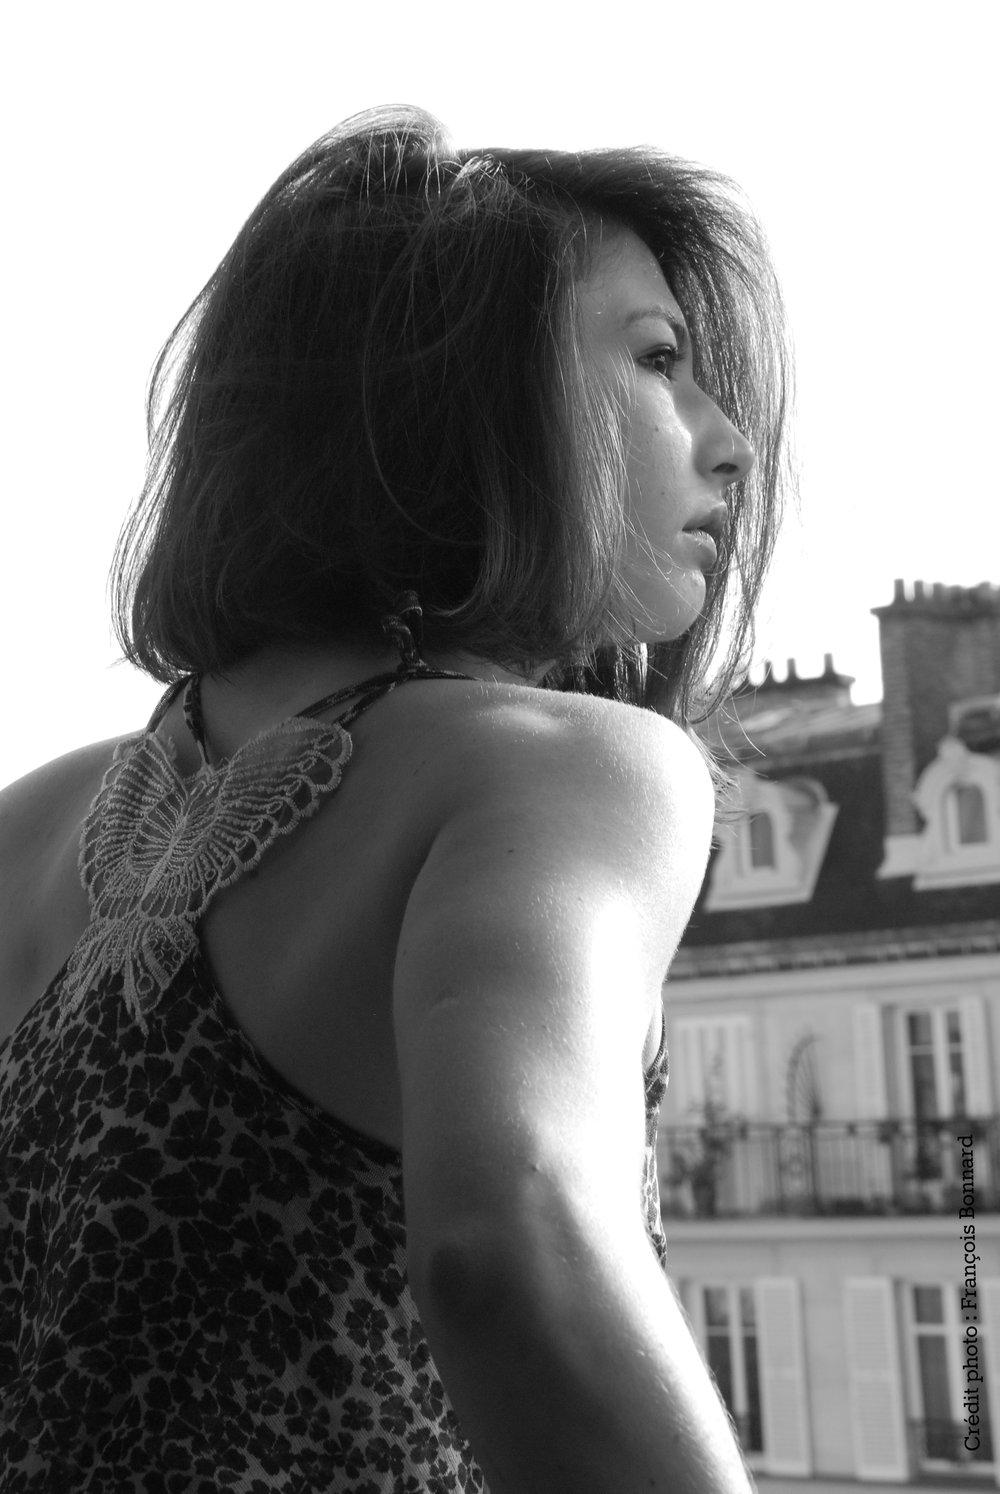 Photographe : François Bonnard